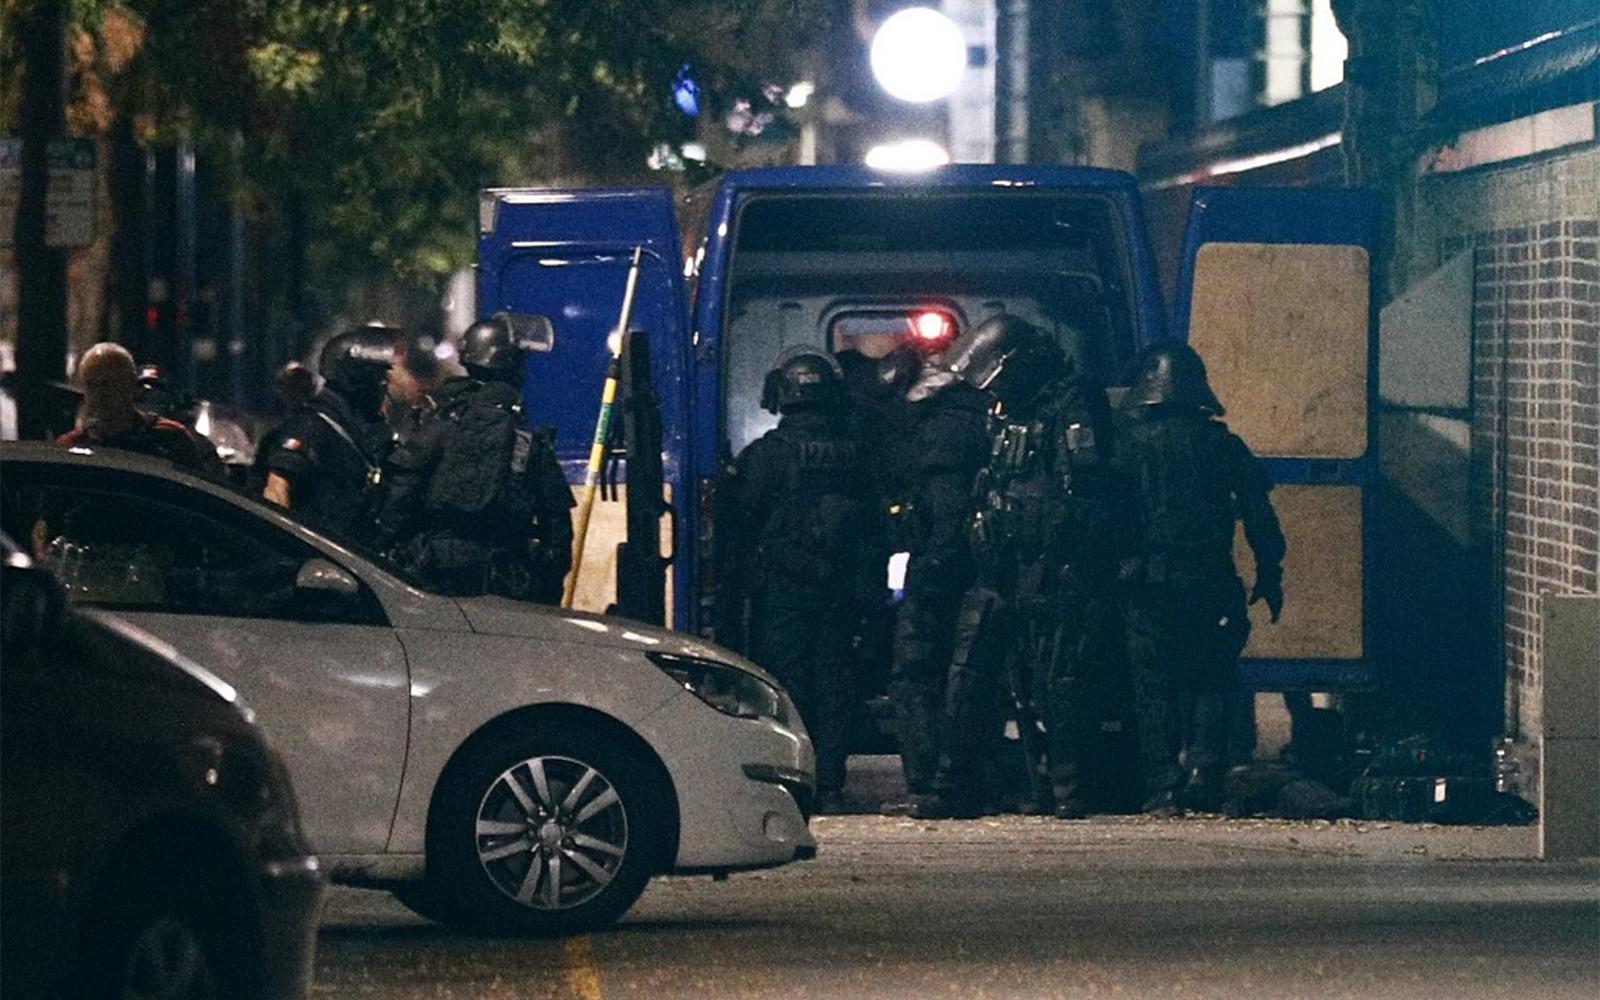 Bernard Tapie: ligoté et battu lors d'un violent cambriolage